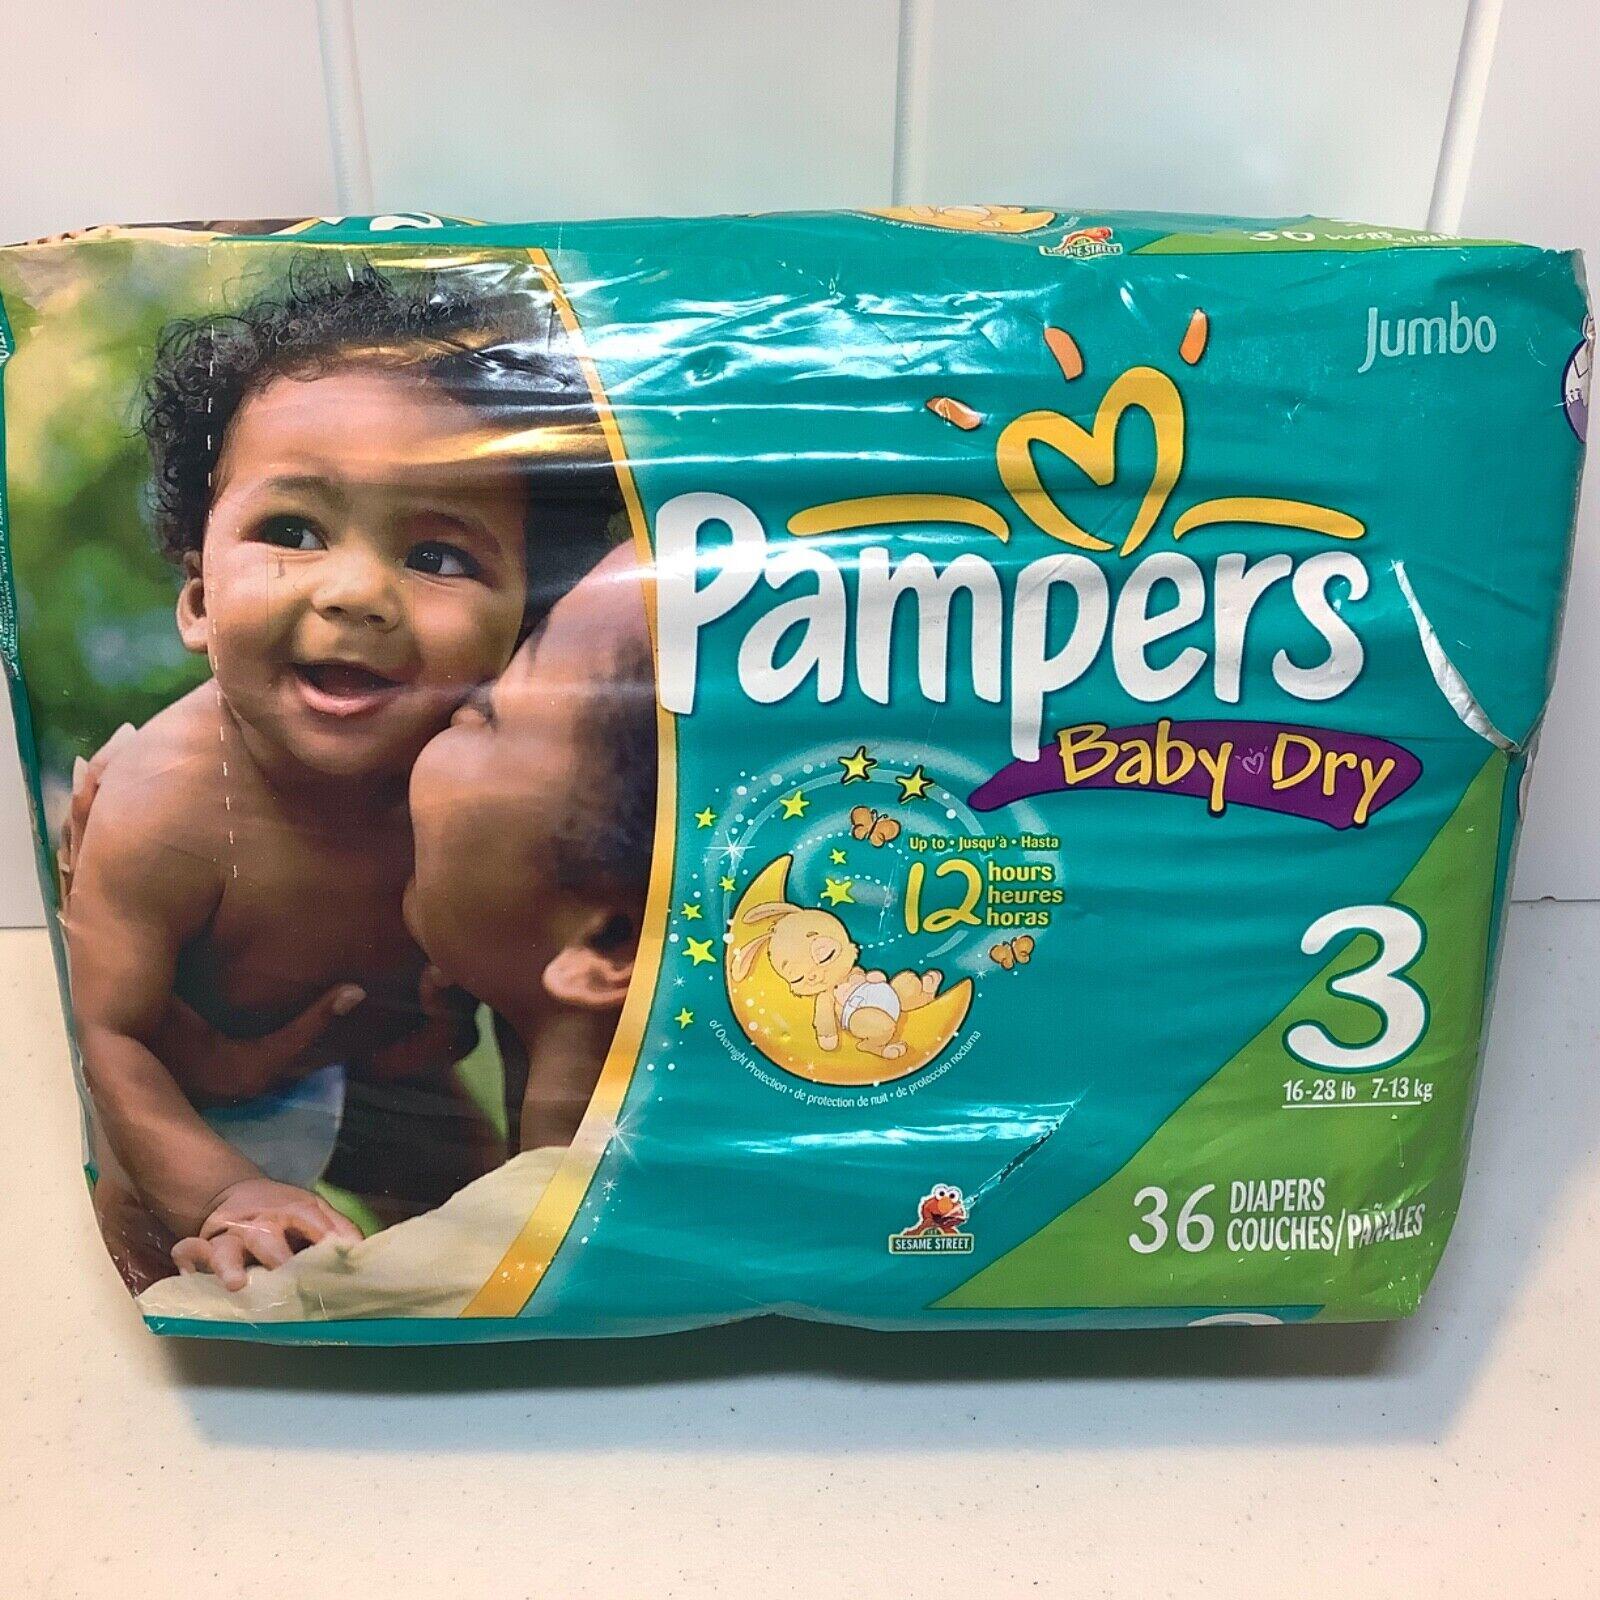 Pampers Baby Dry 2009 VINTAGE Sesame Street Size 3 36 Diapers Jumbo Pack ELMO - $34.99